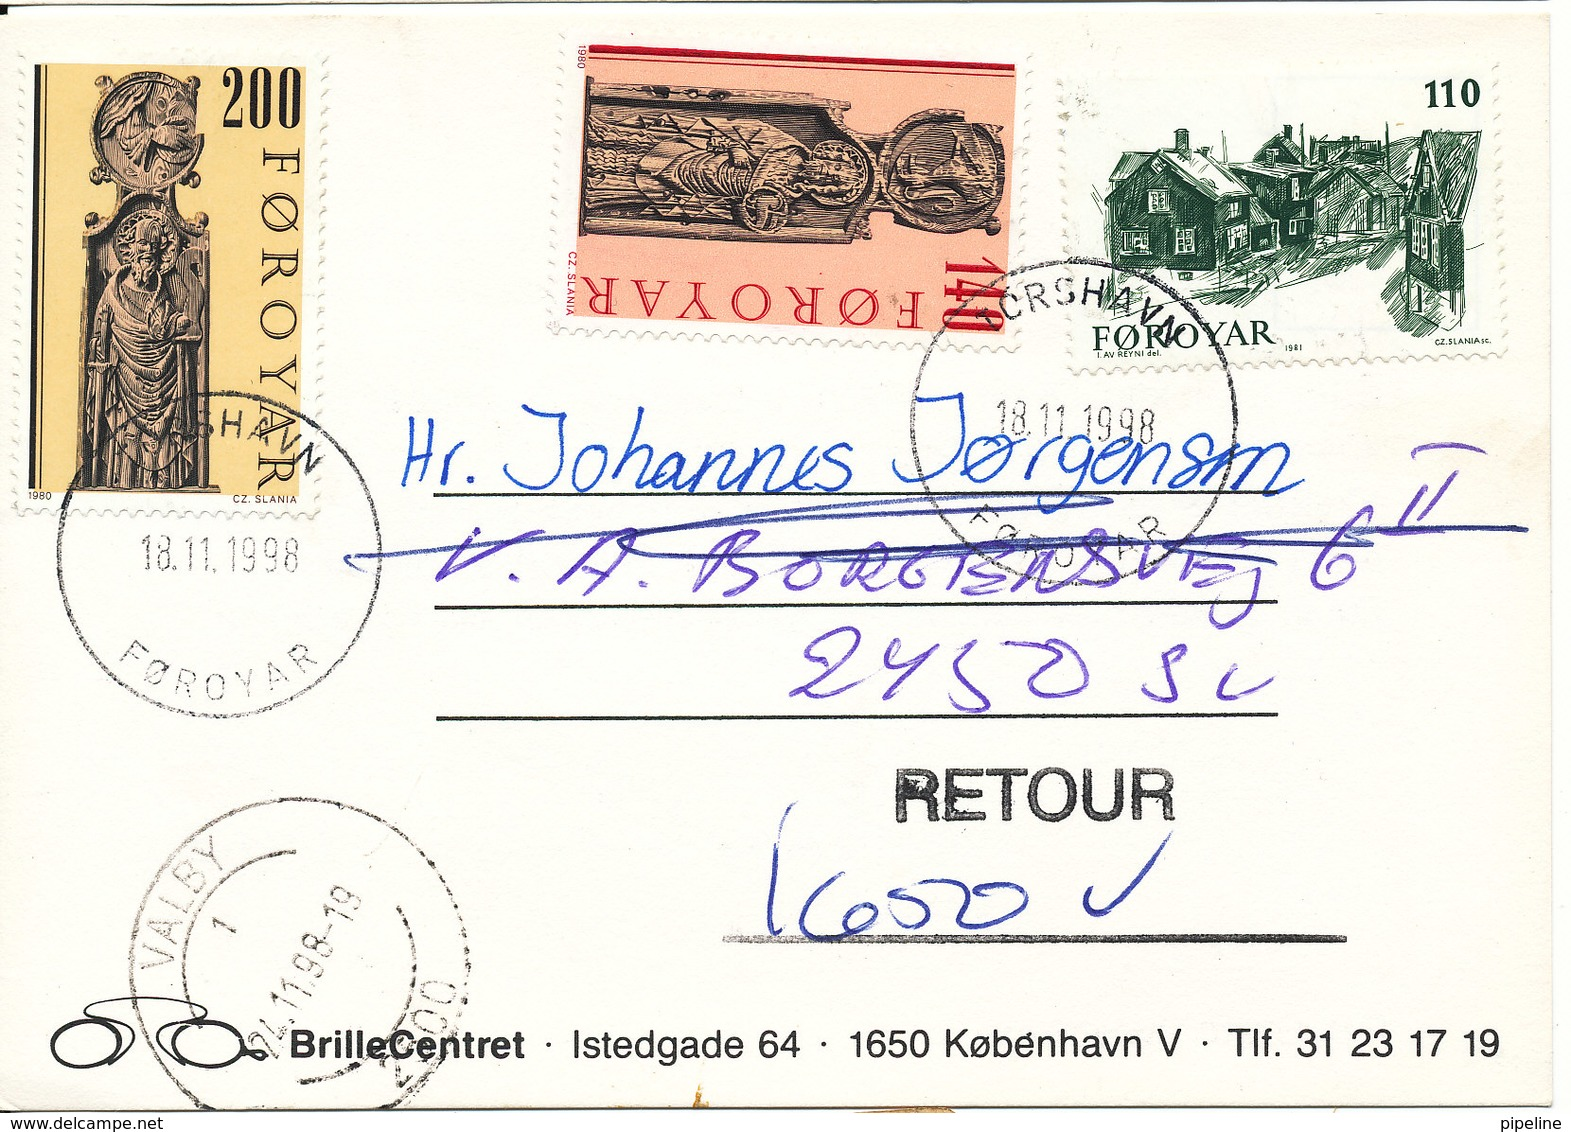 Faroe Islands Postcard Thorshavn 18-11-1998 Sent To Denmark And Returned (unknown At The Address) - Faroe Islands